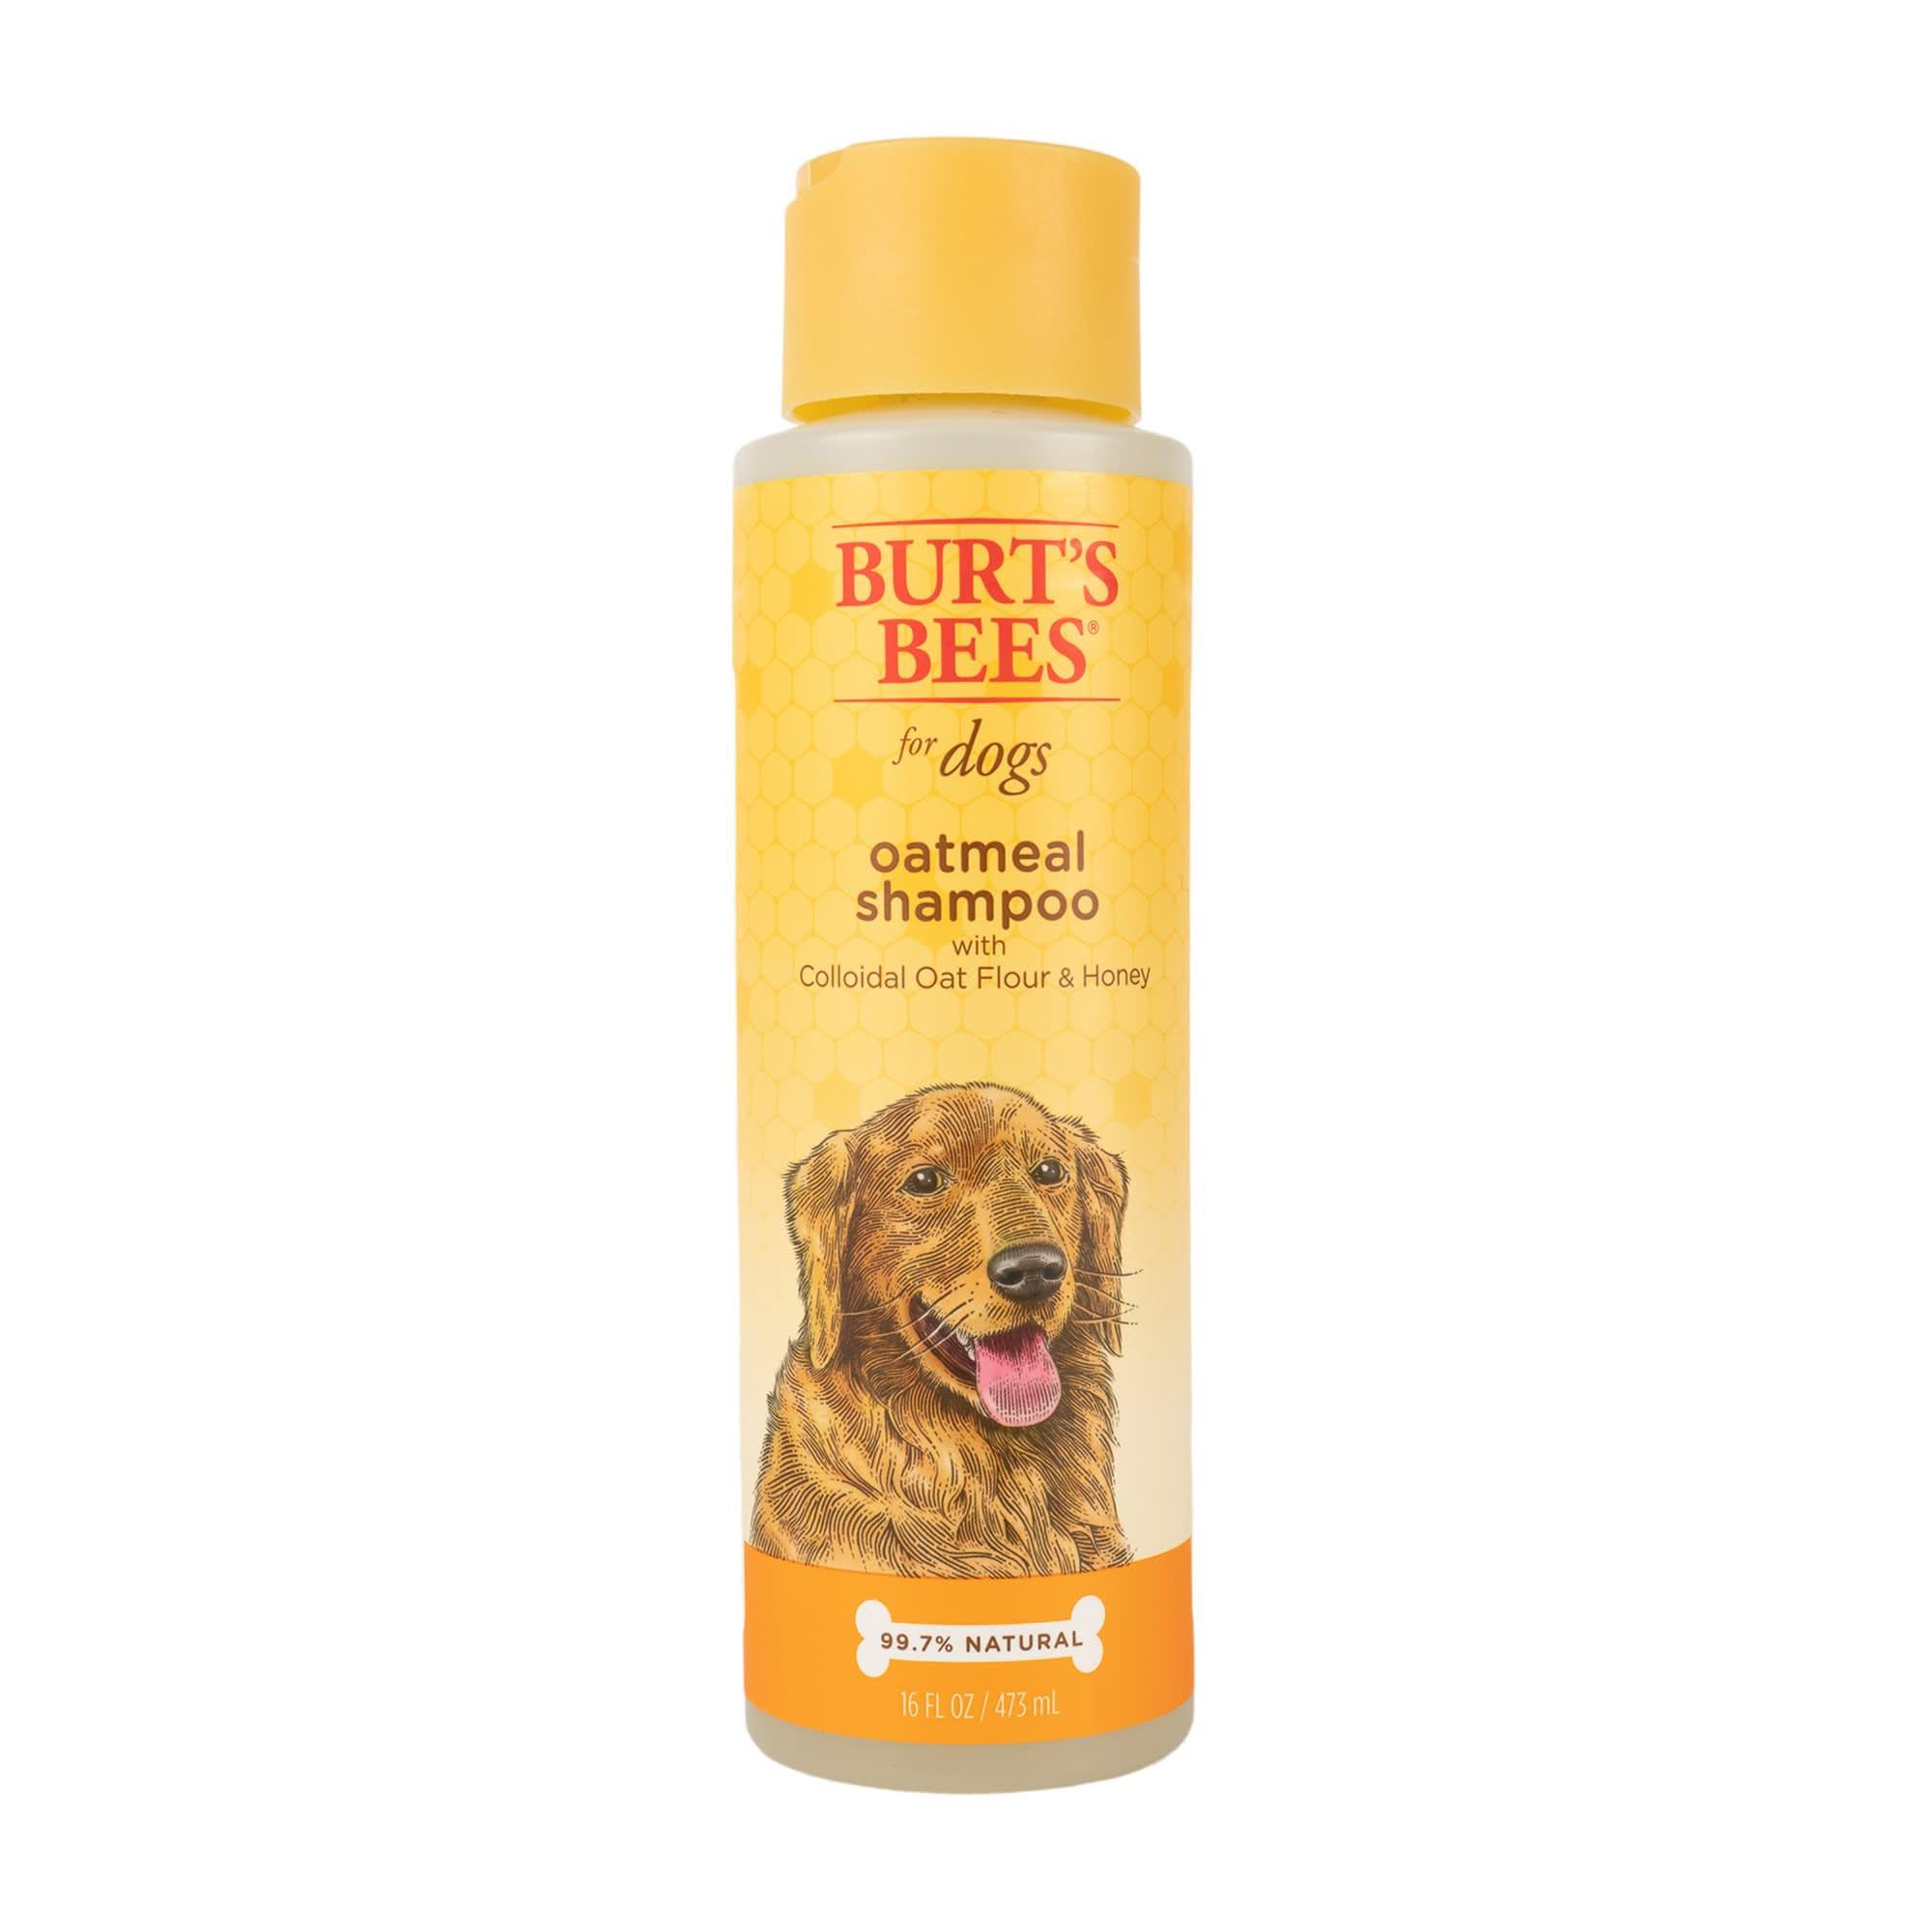 Burts Bees - Burt's Bees Oatmeal Dog Shampoo, 16 fl. oz. | Petco